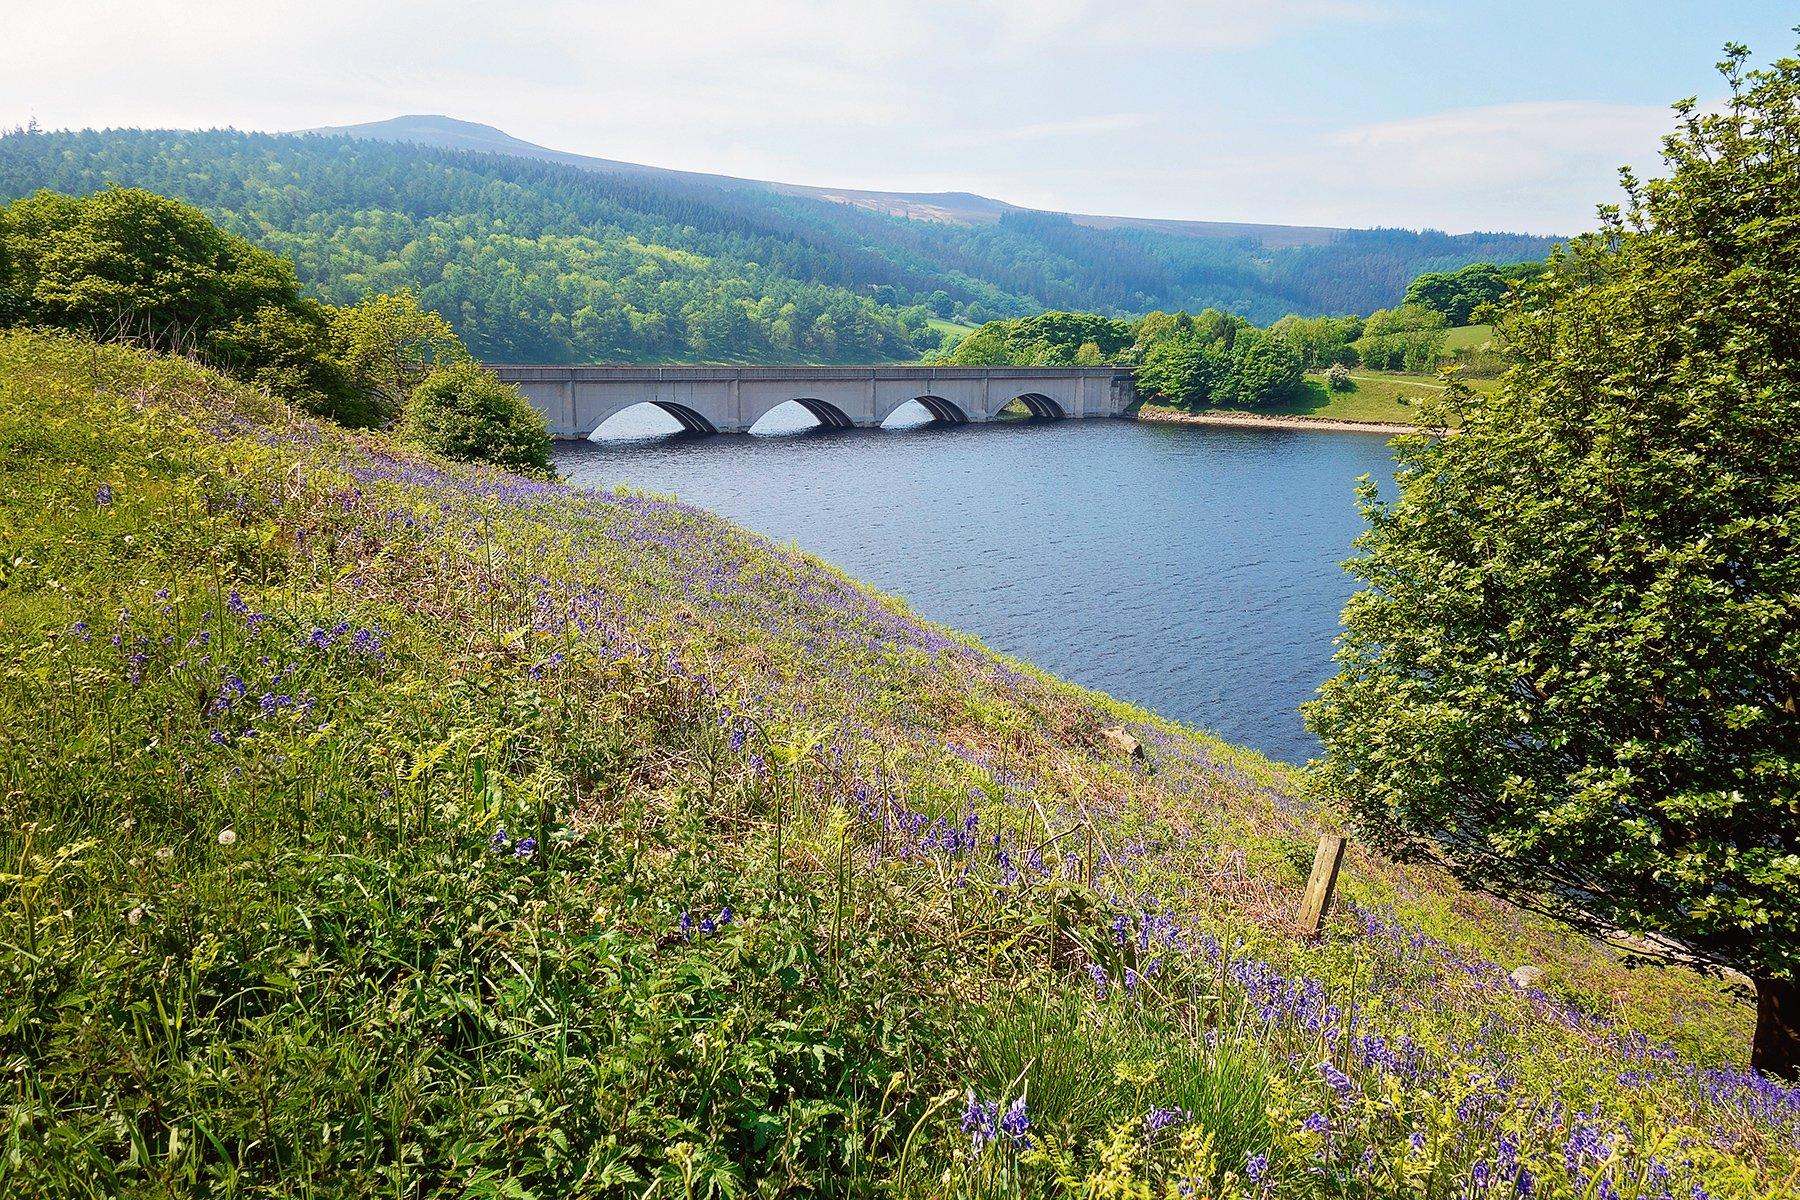 Perfect walk around Ladybower Reservoir full of bluebells